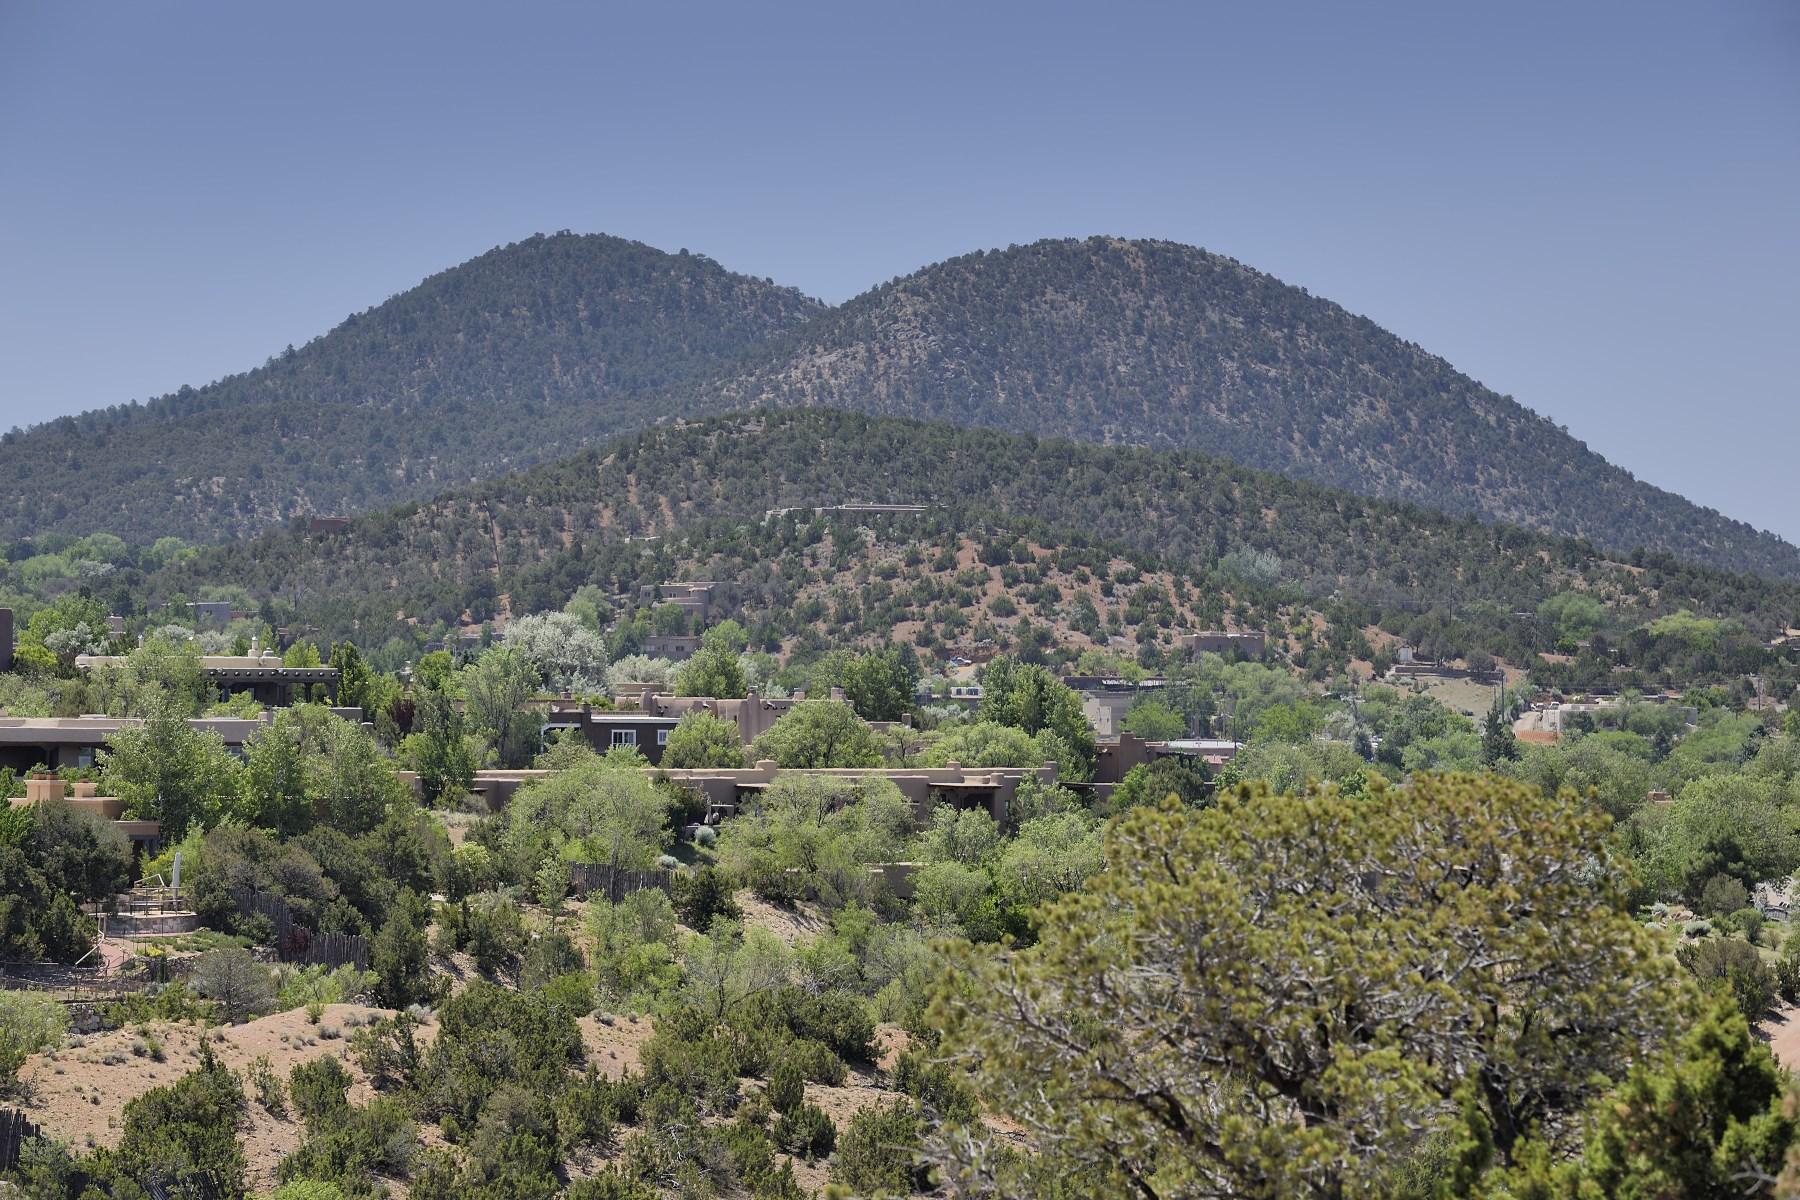 Land for Sale at 805 La Vereda Este, Lot 90 805 La Vereda Este Lot 90 Santa Fe City Northeast, Santa Fe, New Mexico, 87501 United States